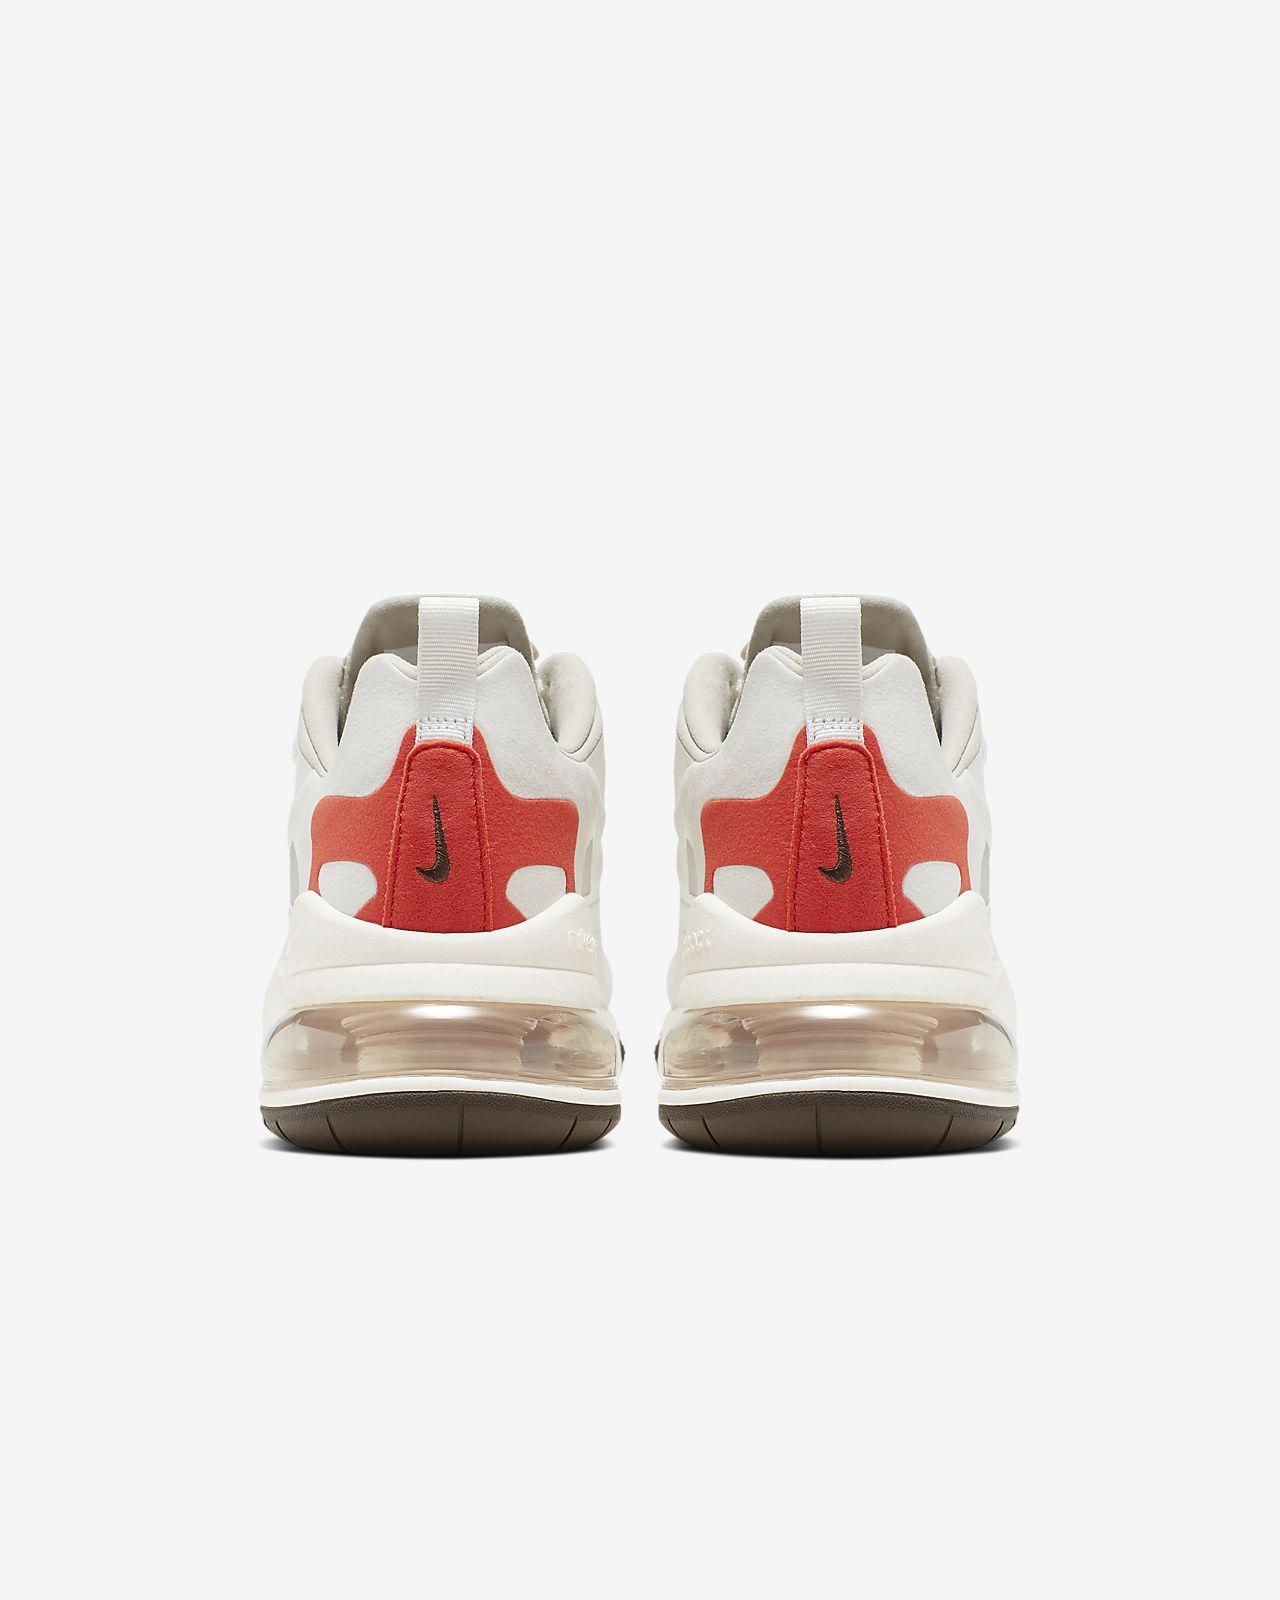 Nike Air Max 270 React (Mid Century Art) Men's Shoes